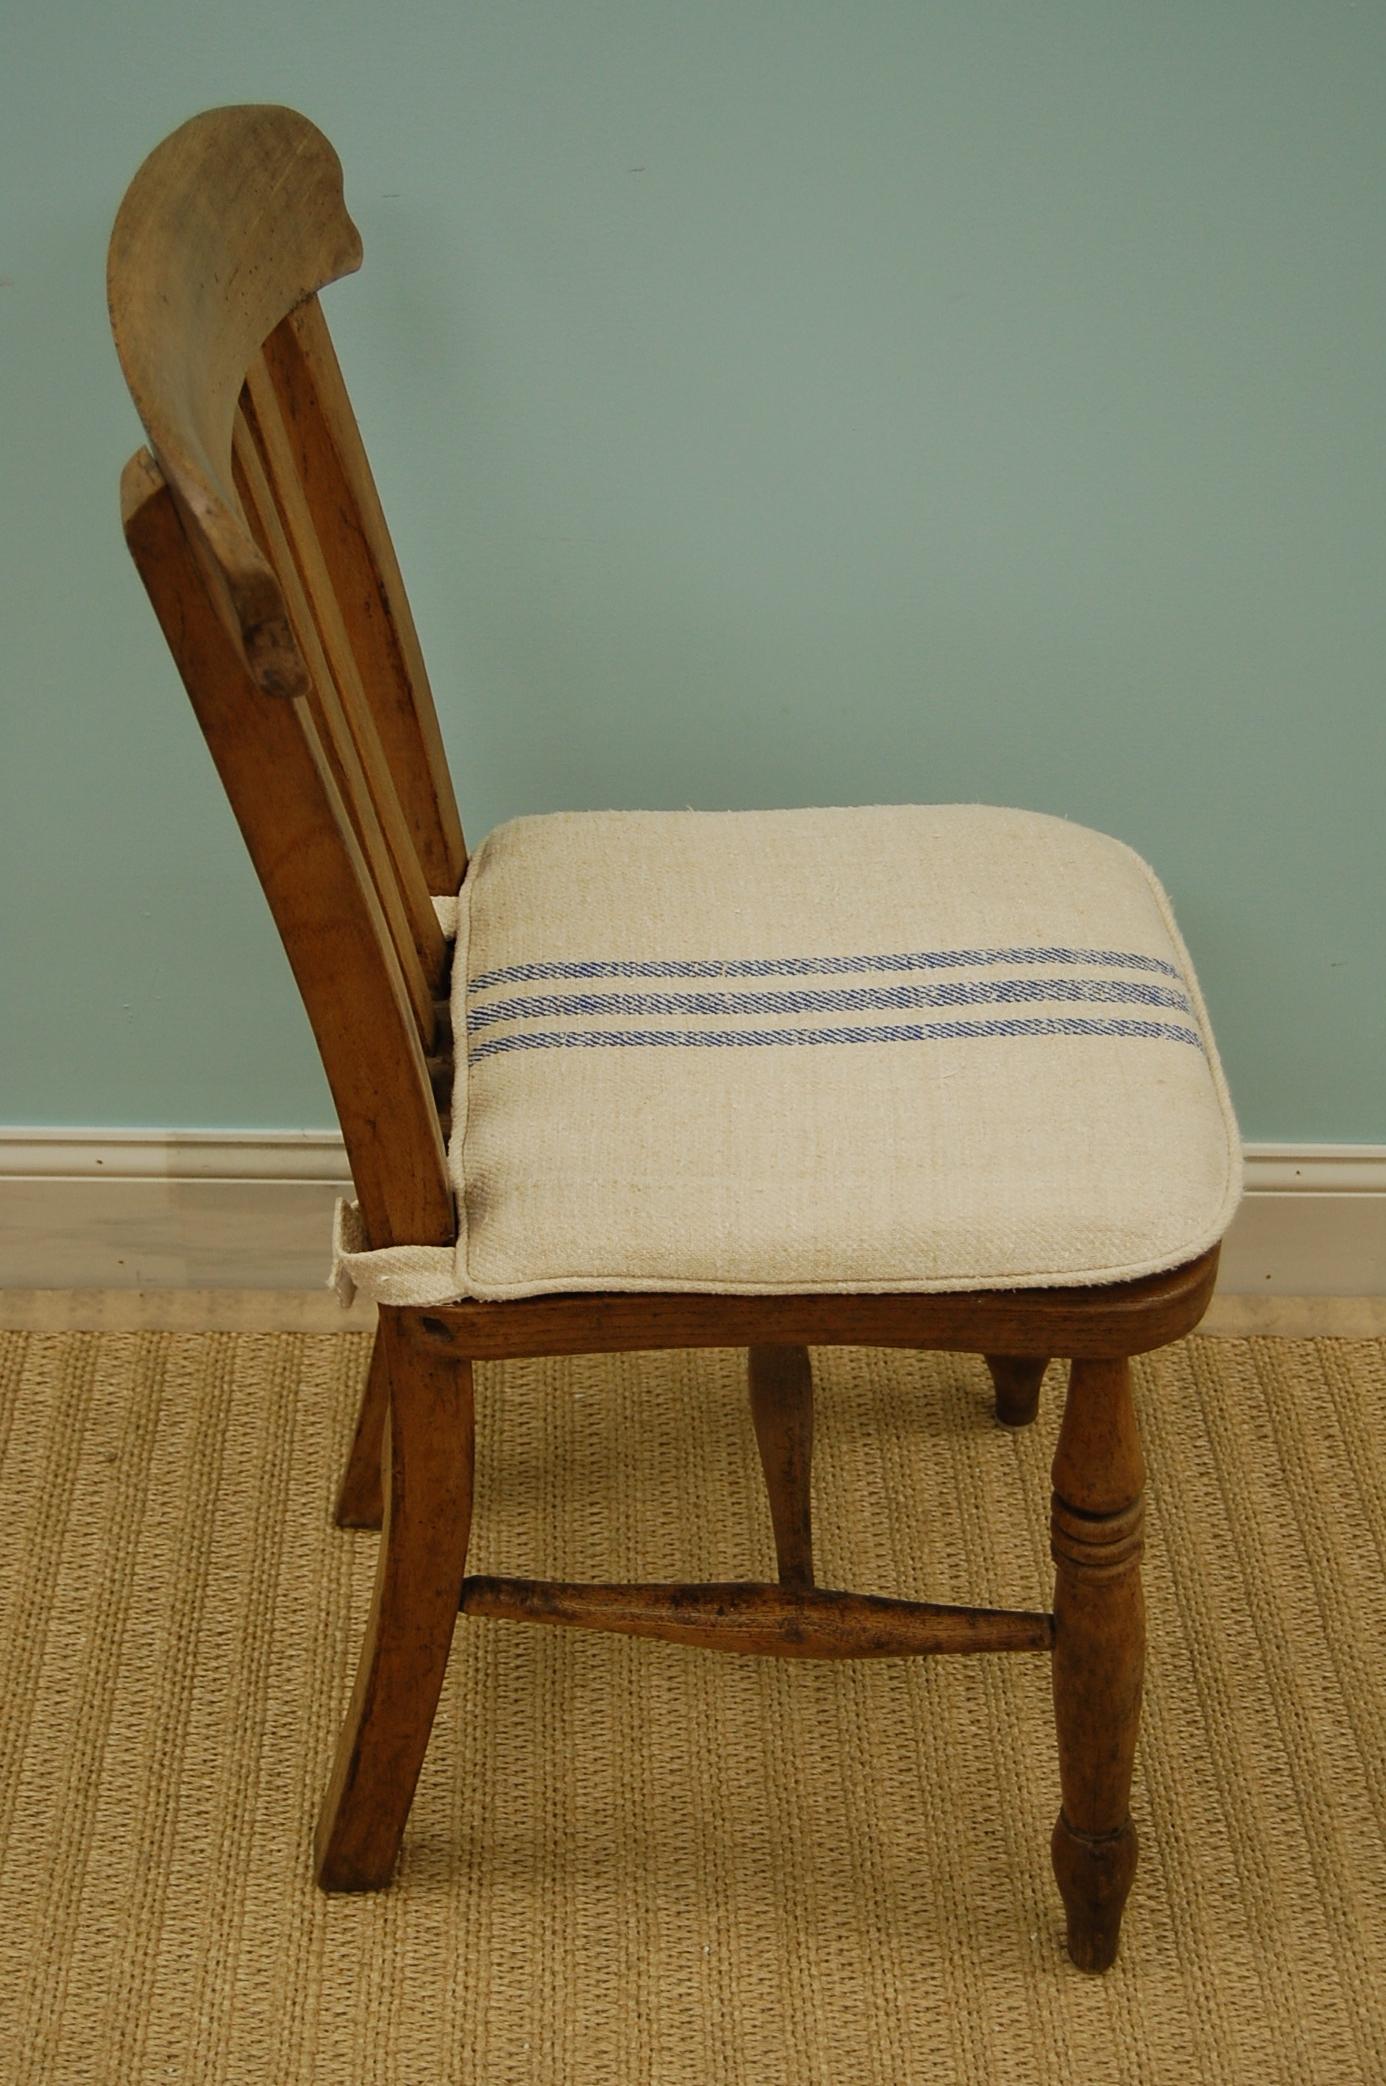 Vintage Chair w/ Seat Cushion